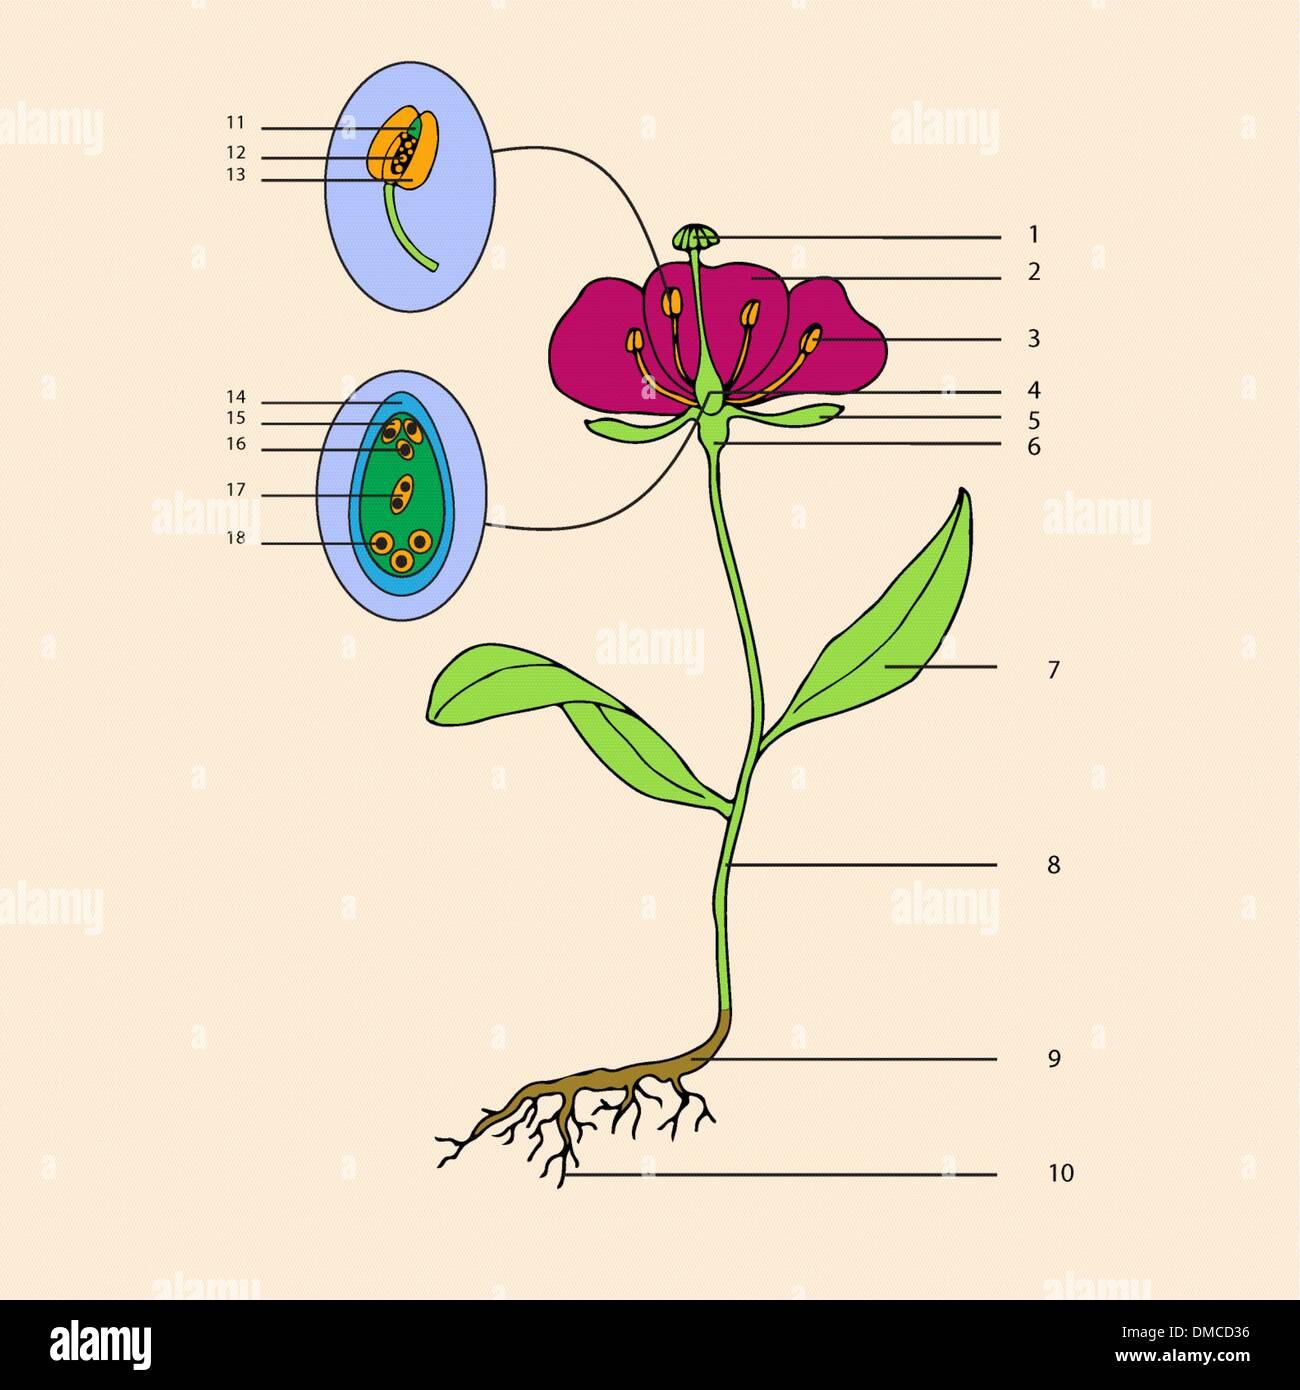 Plant Morphology Stock Photos & Plant Morphology Stock Images - Alamy